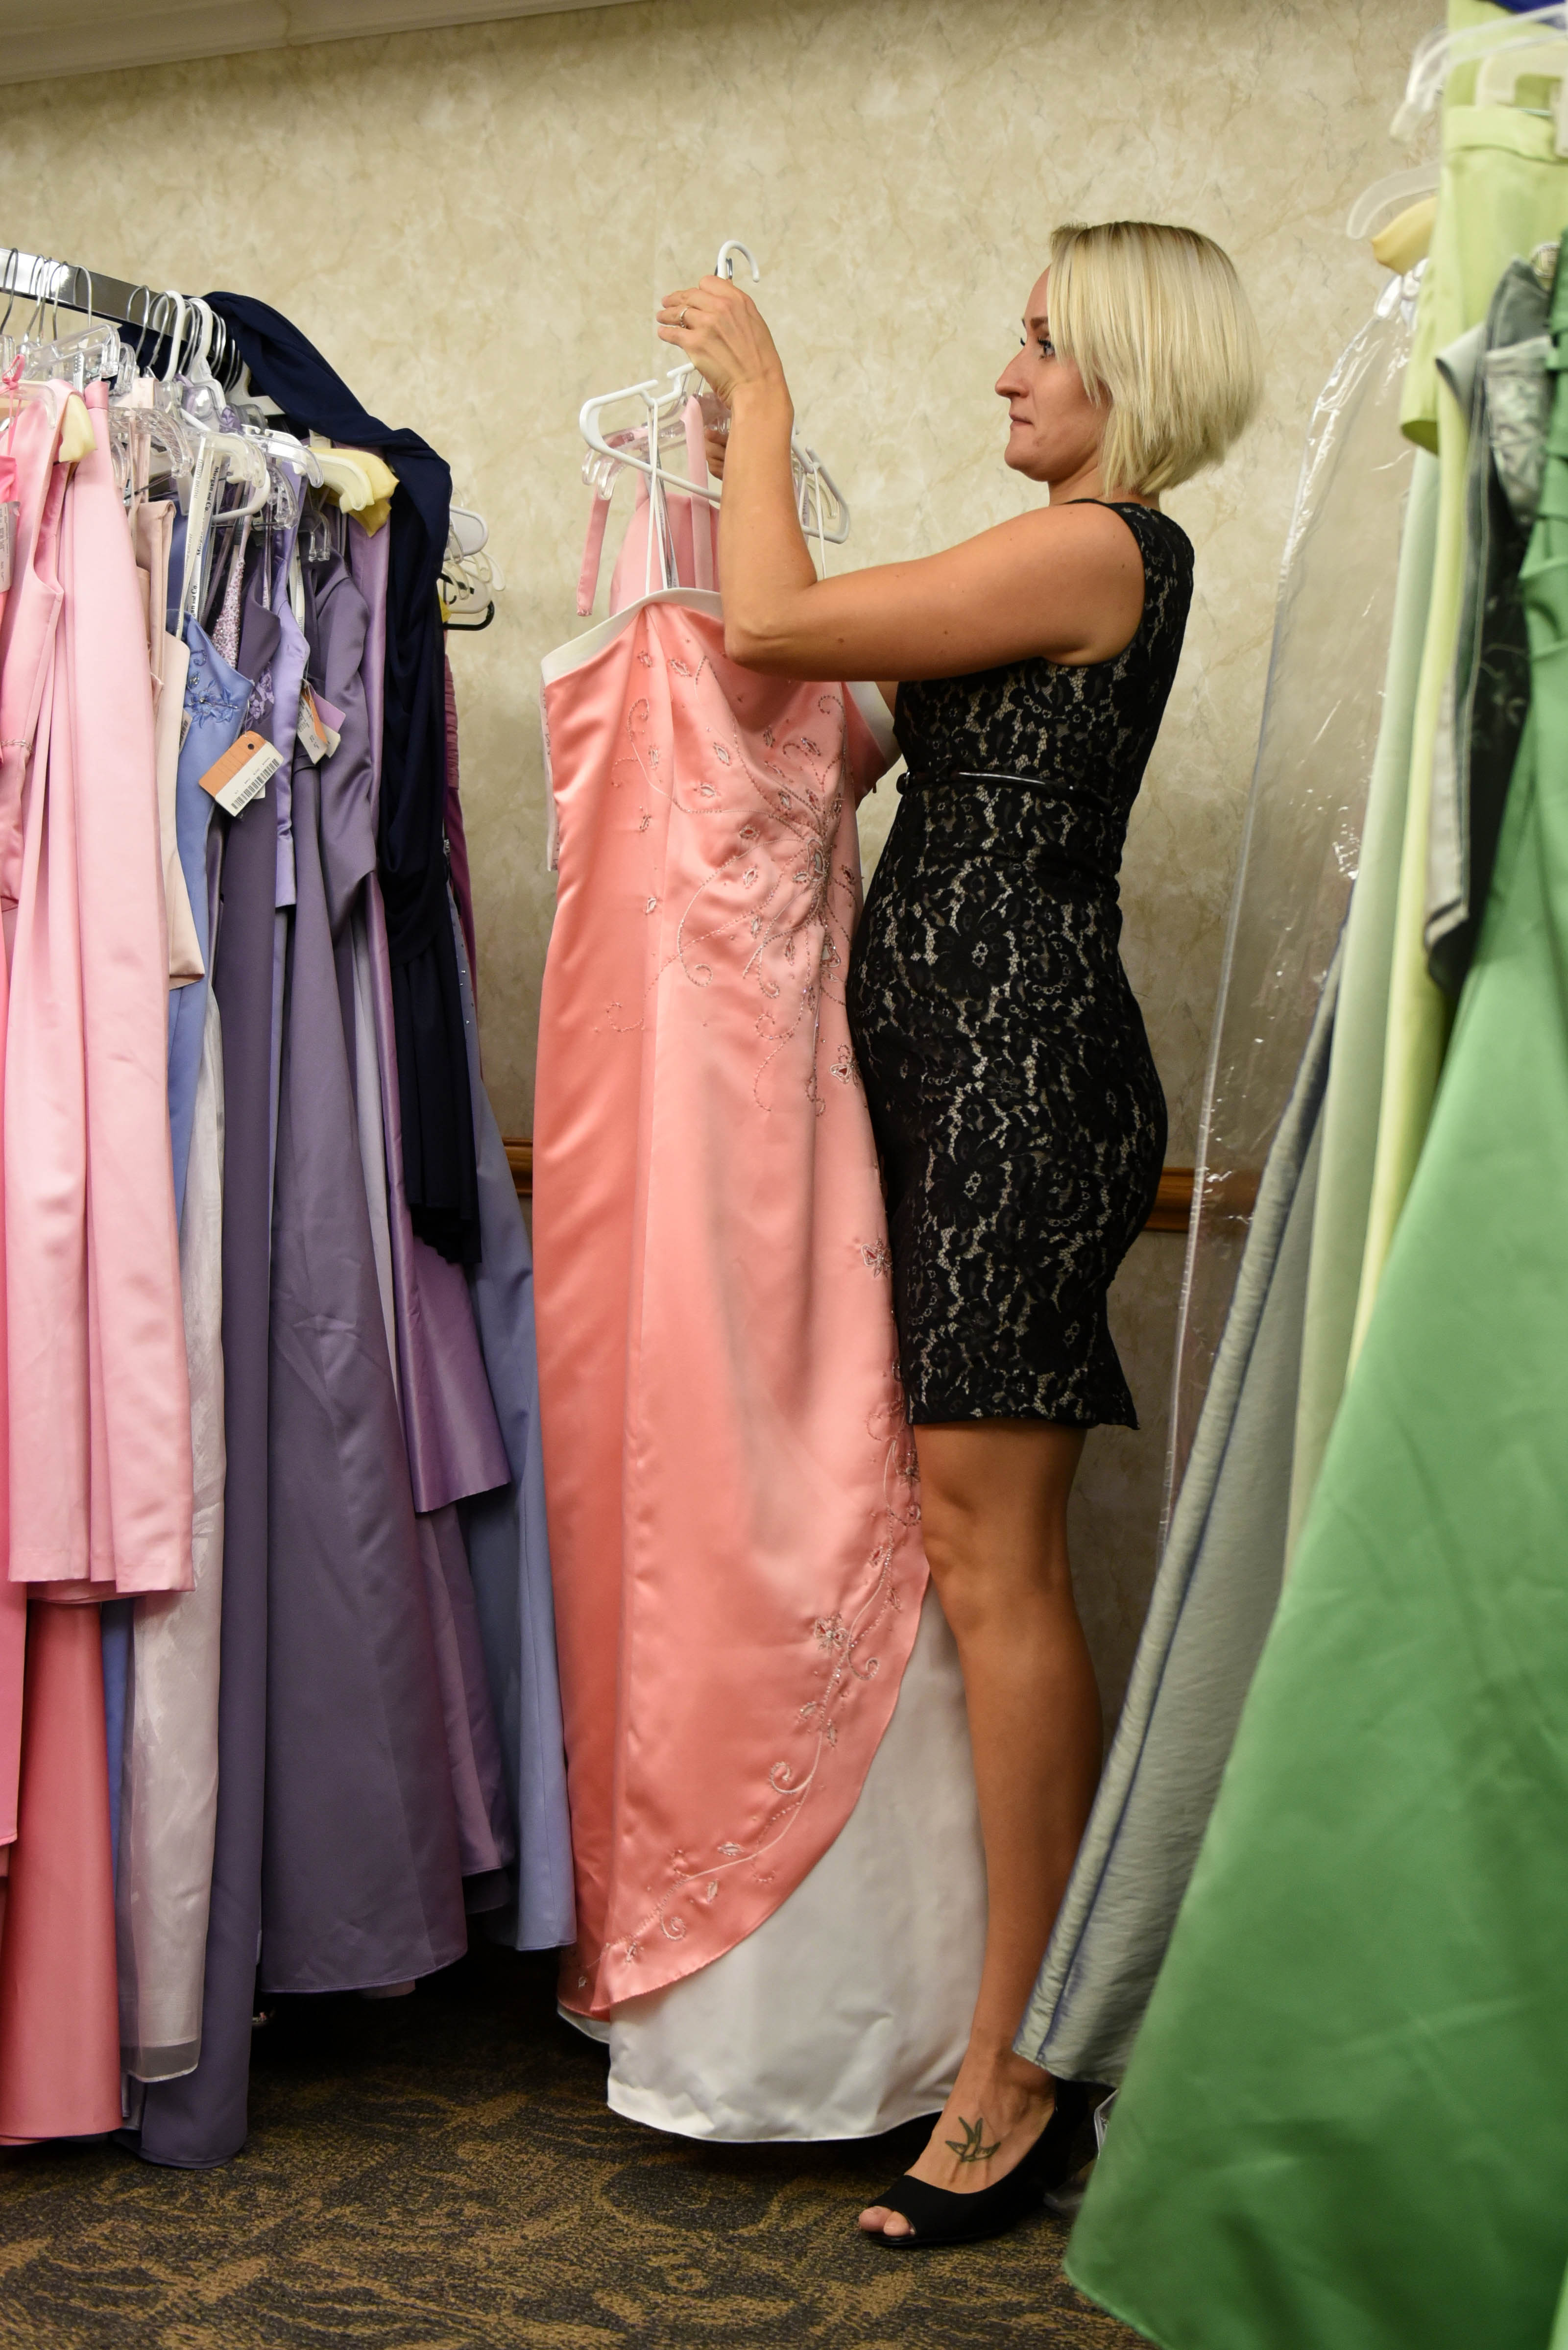 75th Anniversary Gala formal wear: why buy when you can borrow ...